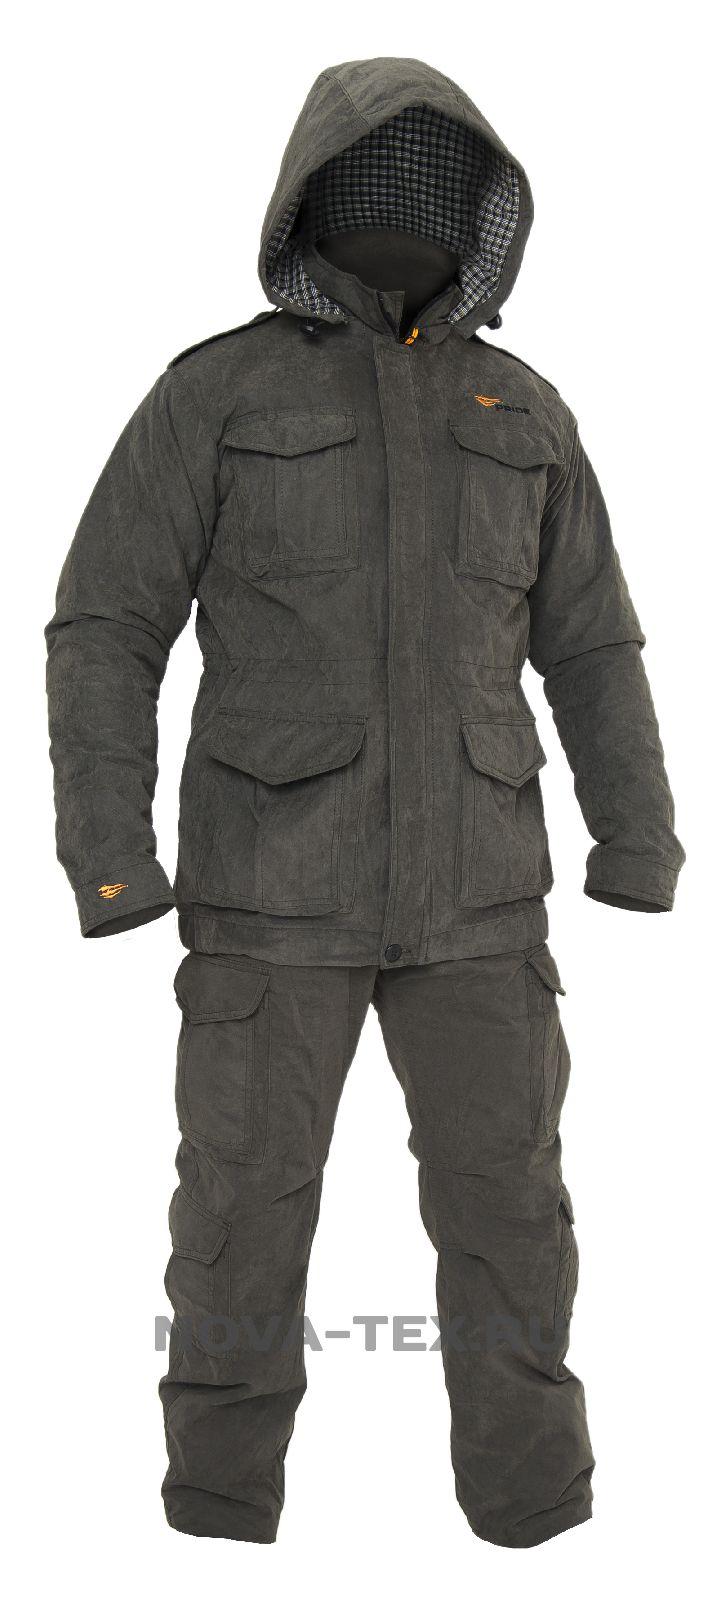 Шутер костюм (финляндия, хаки) PRIDE